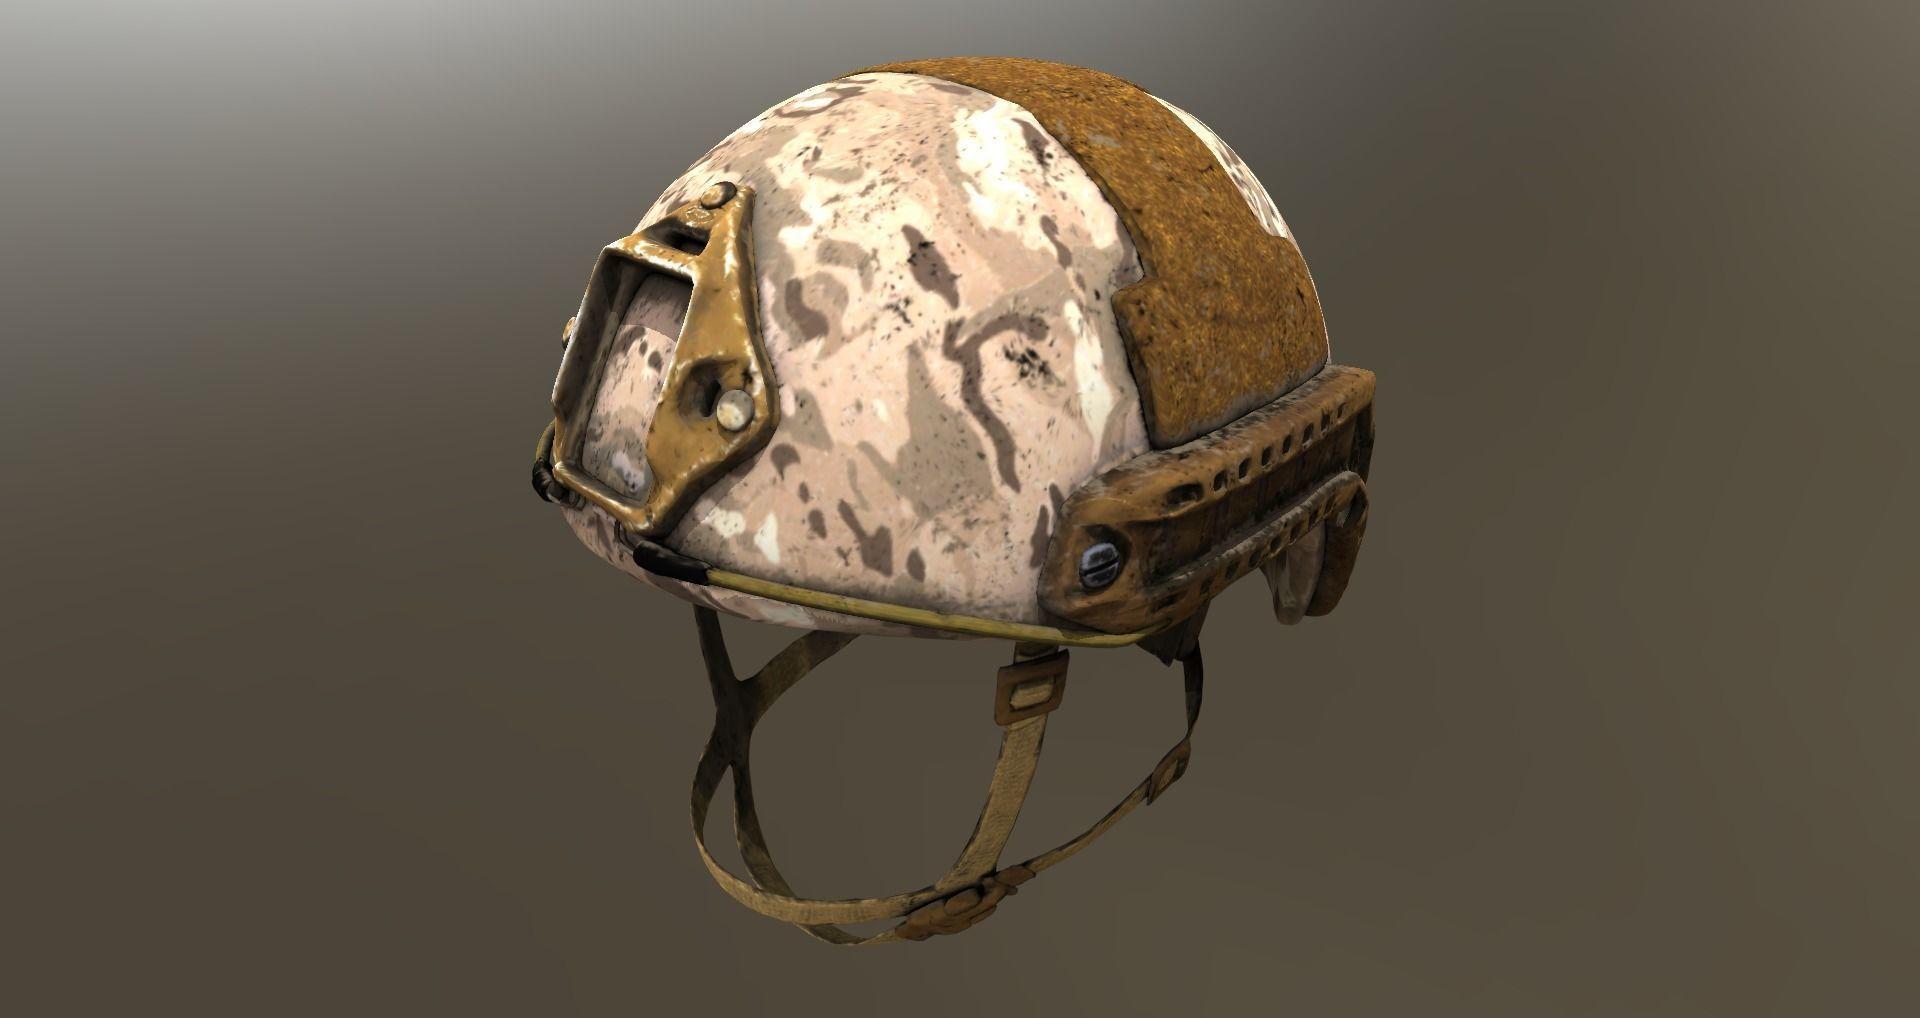 Three Ops-Core FAST Ballistic Helmets